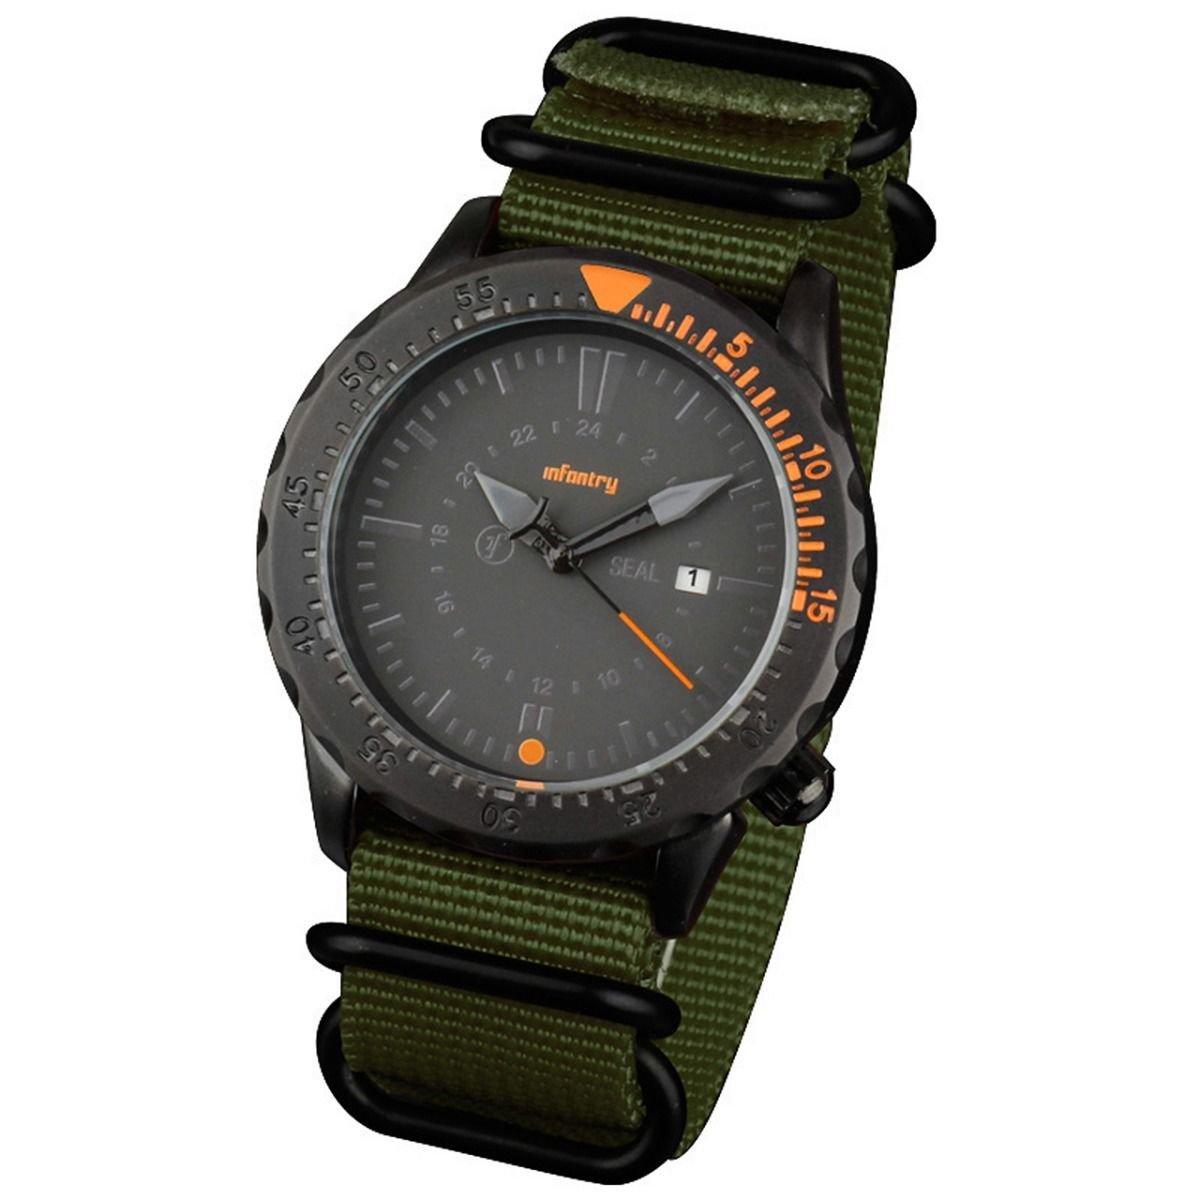 Green Band and Orange Infantry Mens Sport Quartz Watch Tachymeter Bezel Nylon